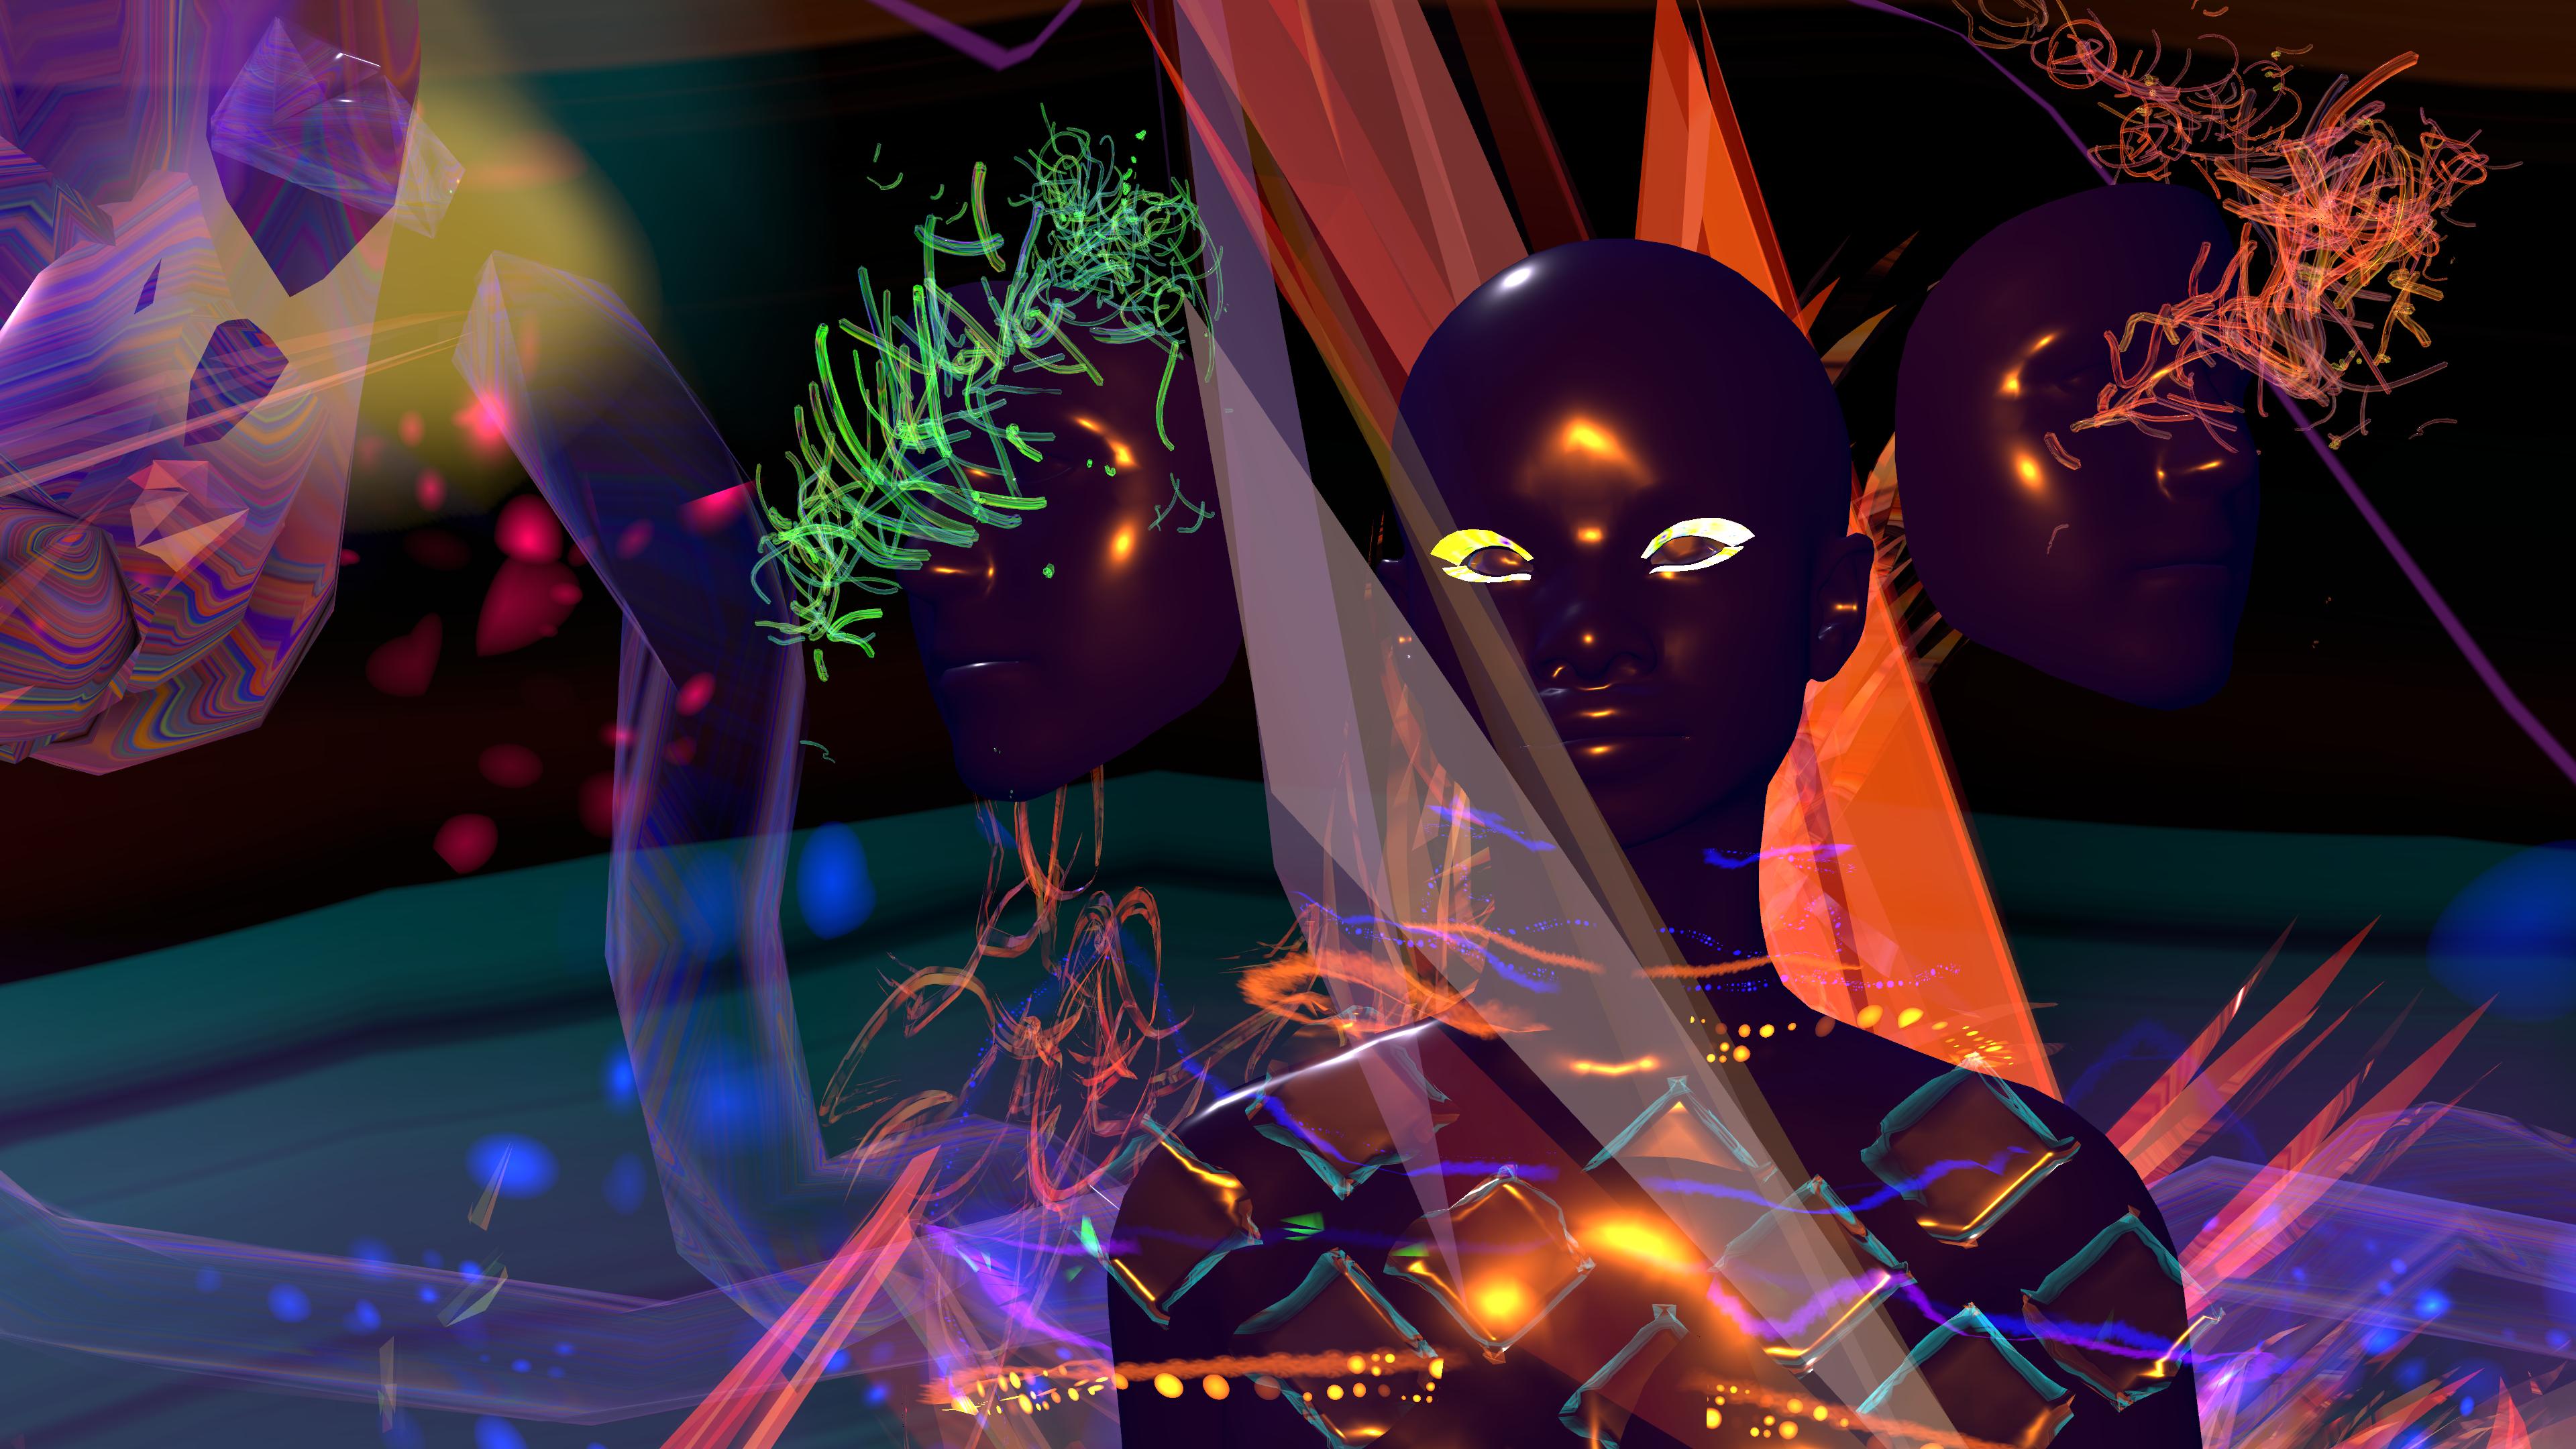 headshot of virtual avatar in virtual environmnent